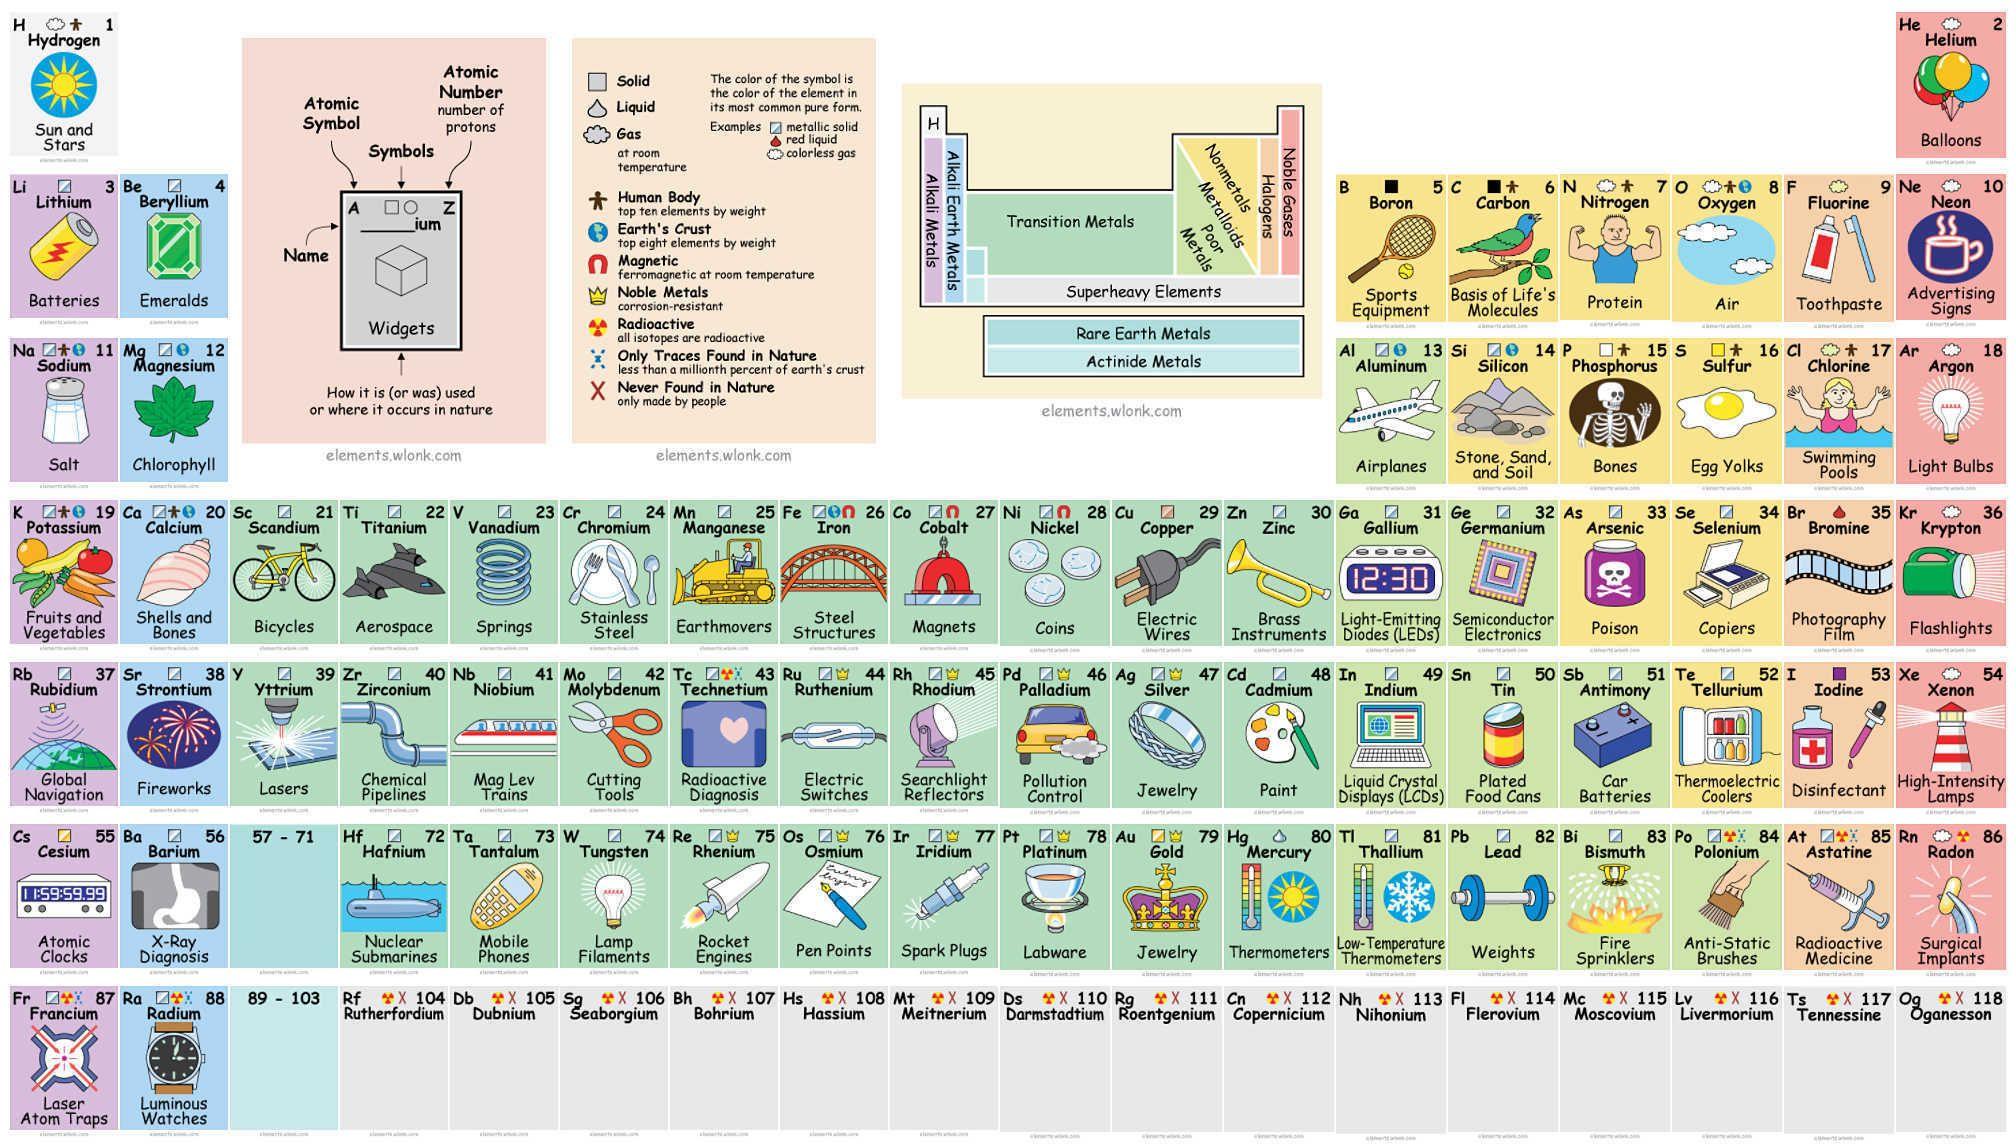 Tabela peridica interativa mostra como realmente usamos os tabela peridica interativa mostra como realmente usamos os elementos urtaz Gallery